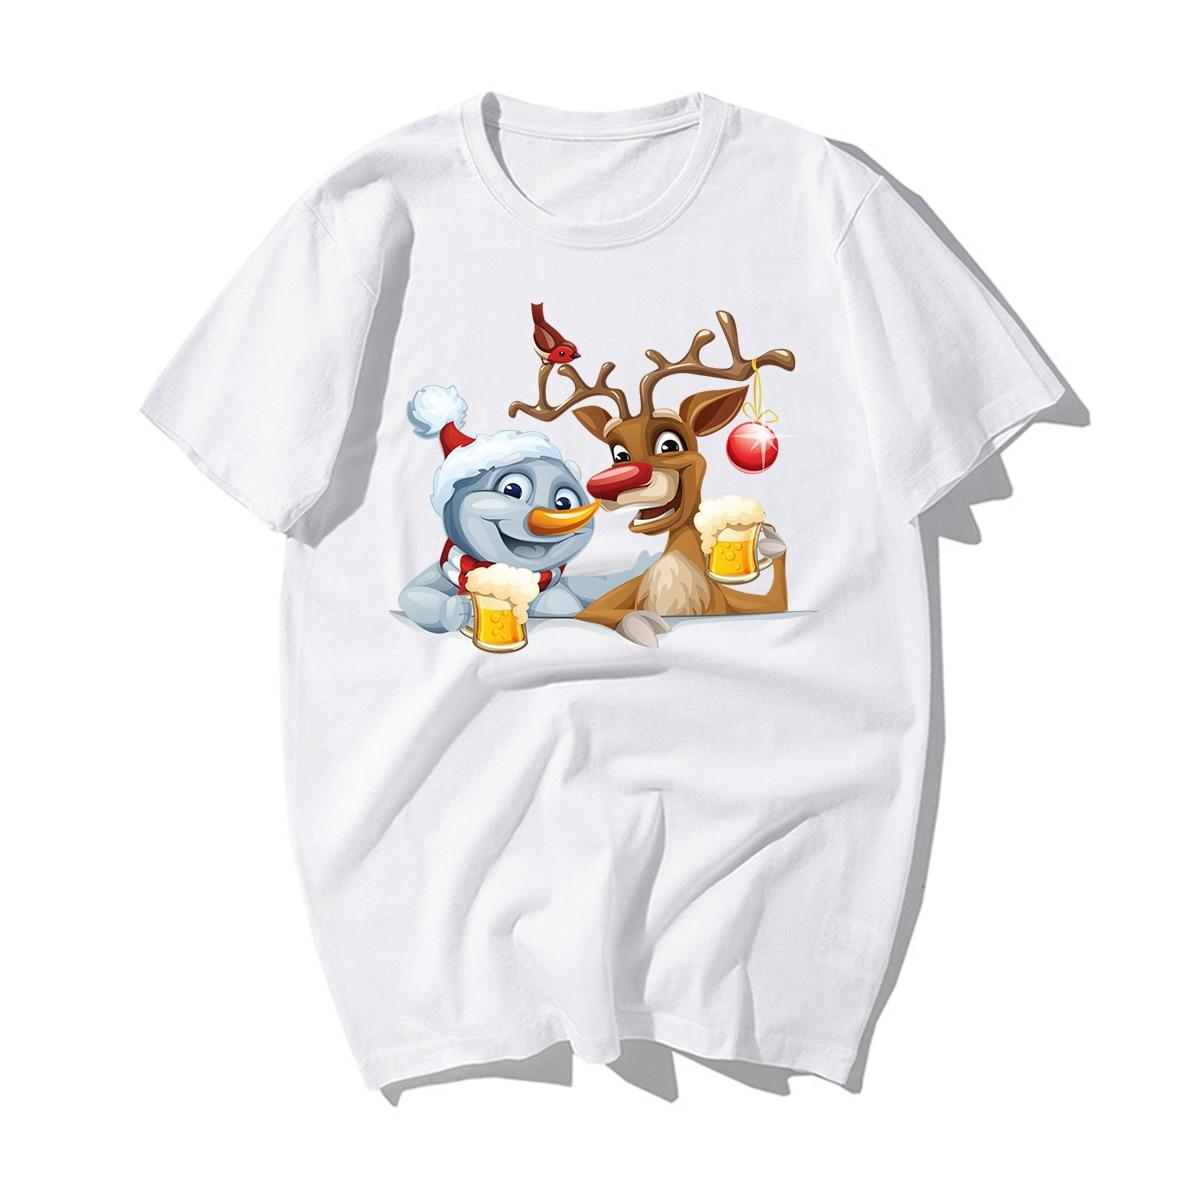 Christmas Casual Pullover Jumper Wellcoda Santa Cute Toy Mens Sweatshirt